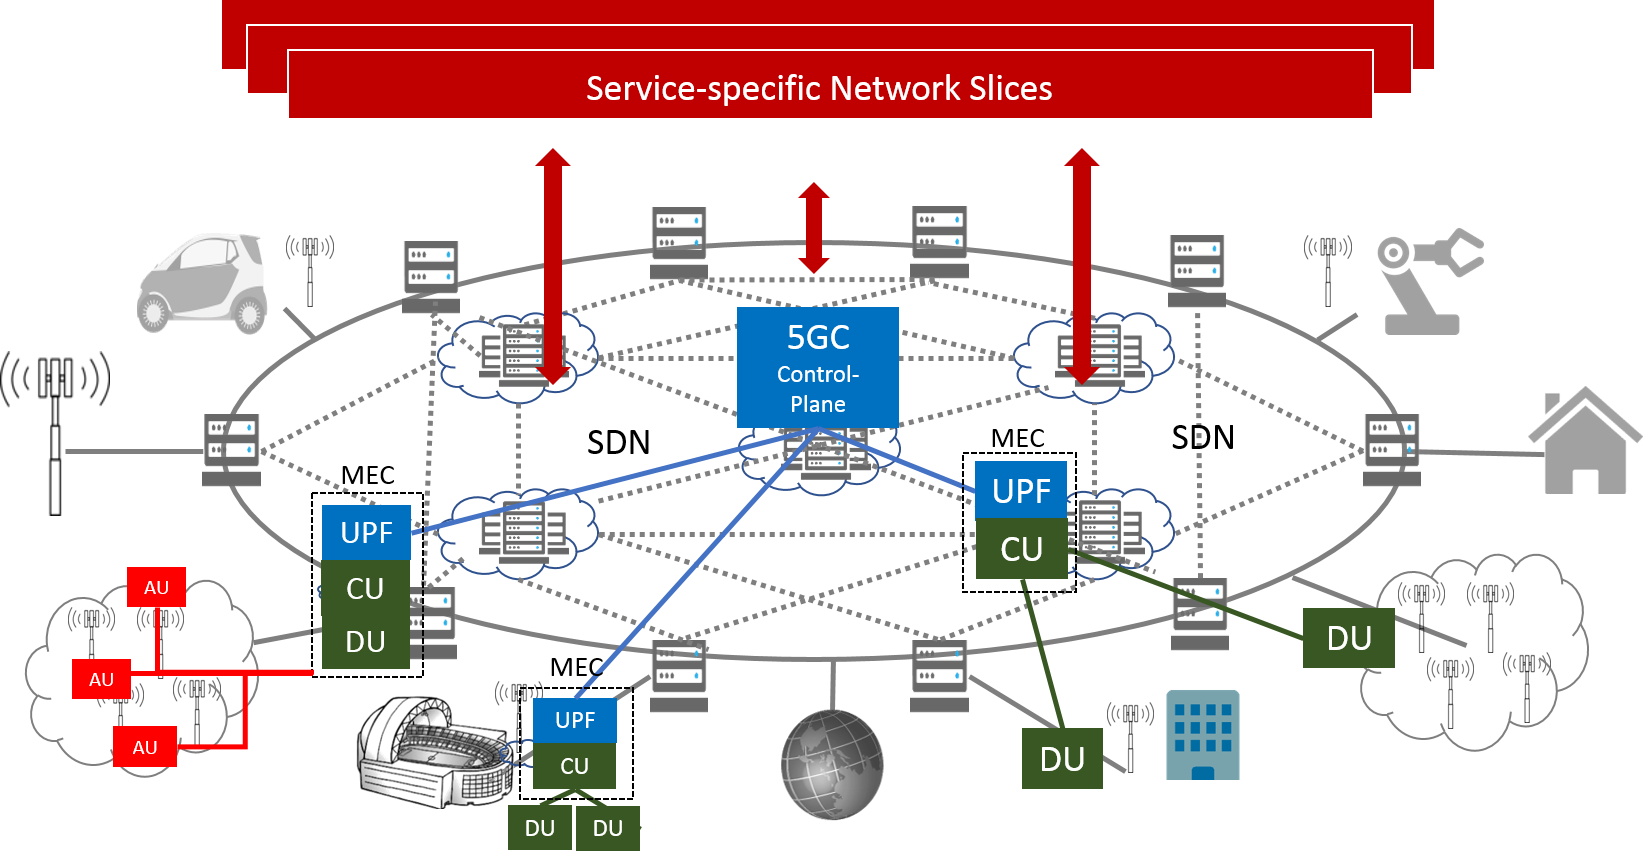 https://www.ibm.com/services/business-continuity/cyber-resilience?p1=Search&p4=43700064924773314&p5=p&gclid=Cj0KCQjw6s2IBhCnARIsAP8RfAiDYBnJmQjxaaIIQiCqNLcnb15SyuF7NHv2CLn5TCrC_baGNmtJCHAaAnT6EALw_wcB&gclsrc=aw.ds